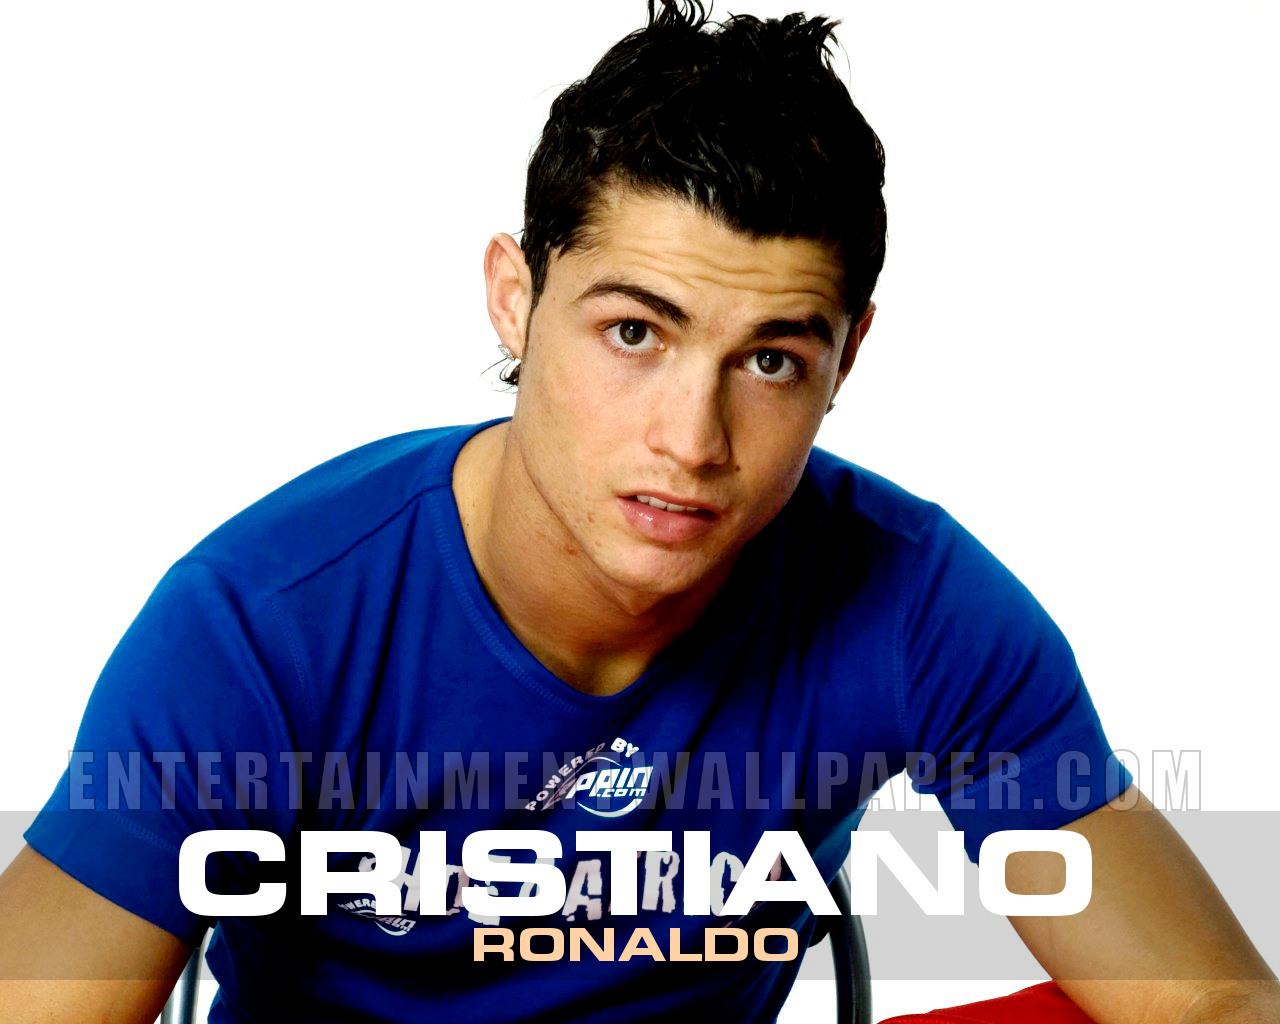 Printest Cristiano Ronaldo International